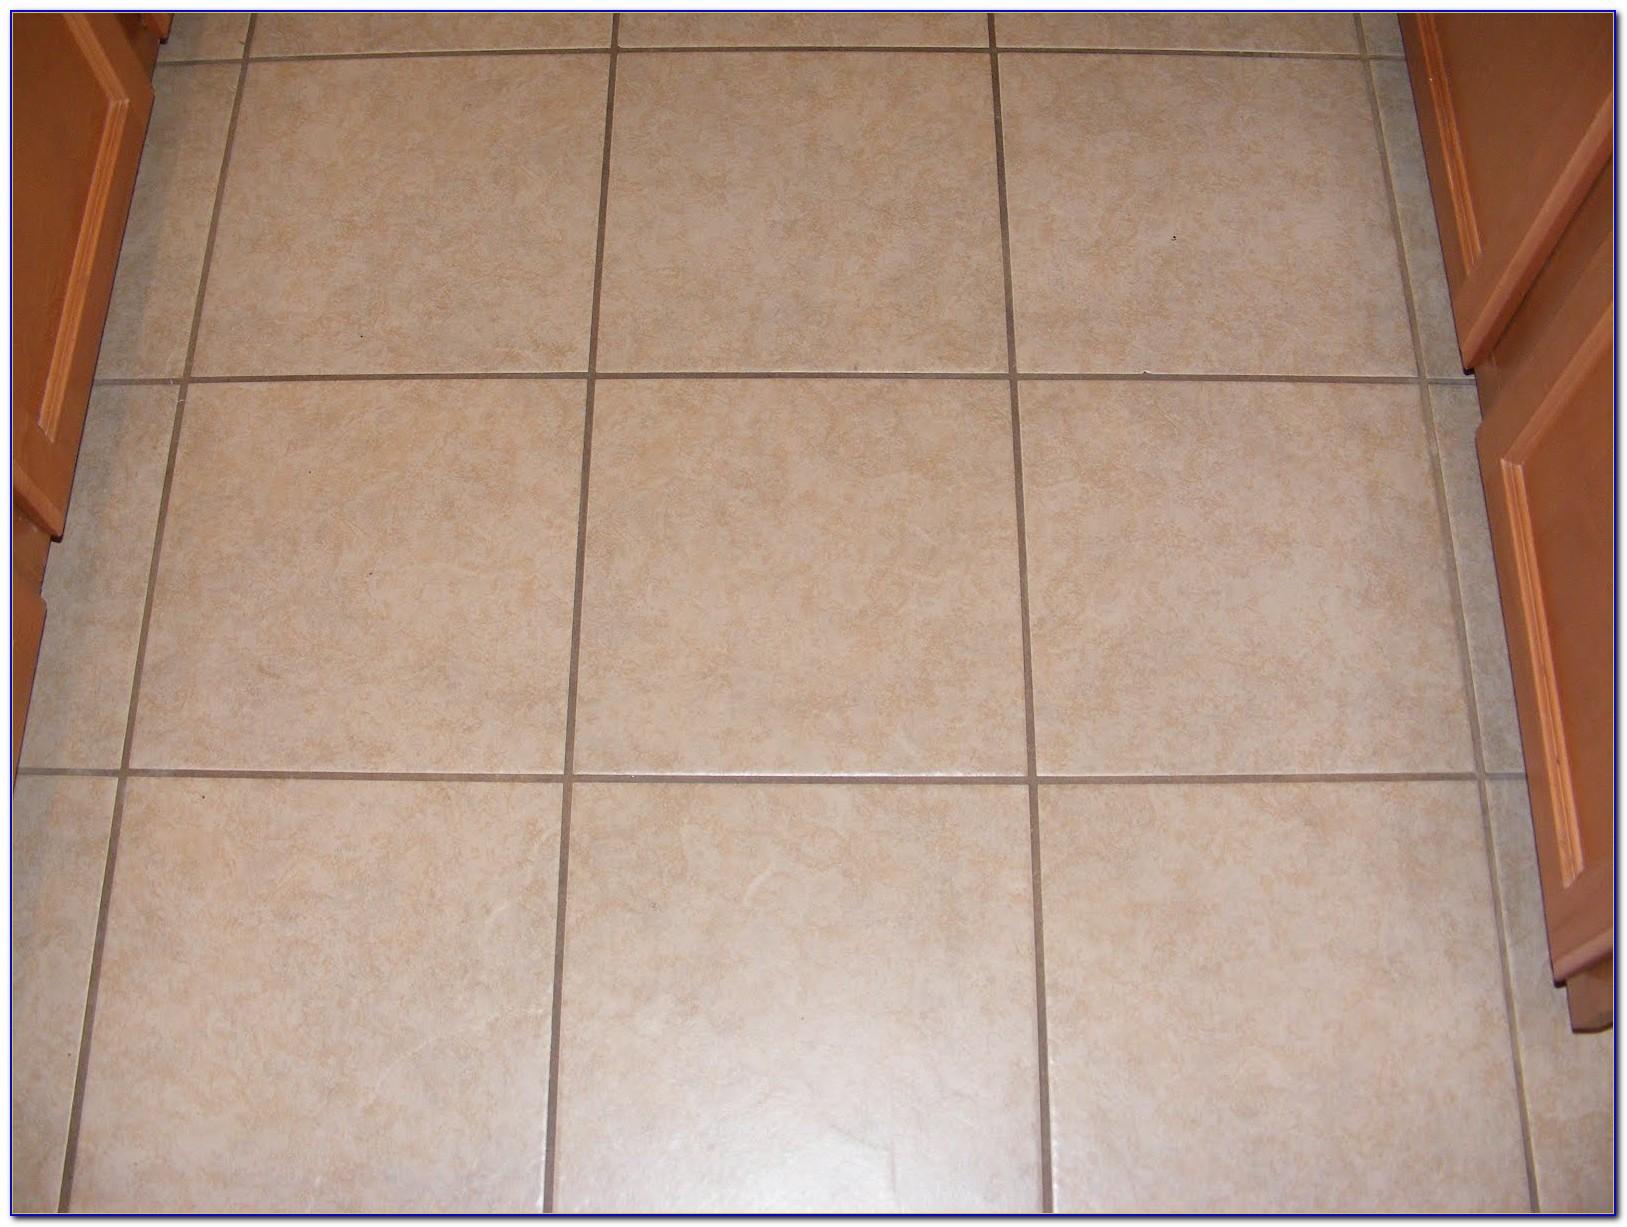 Best Steam Mop For Tile And Hardwood Floors